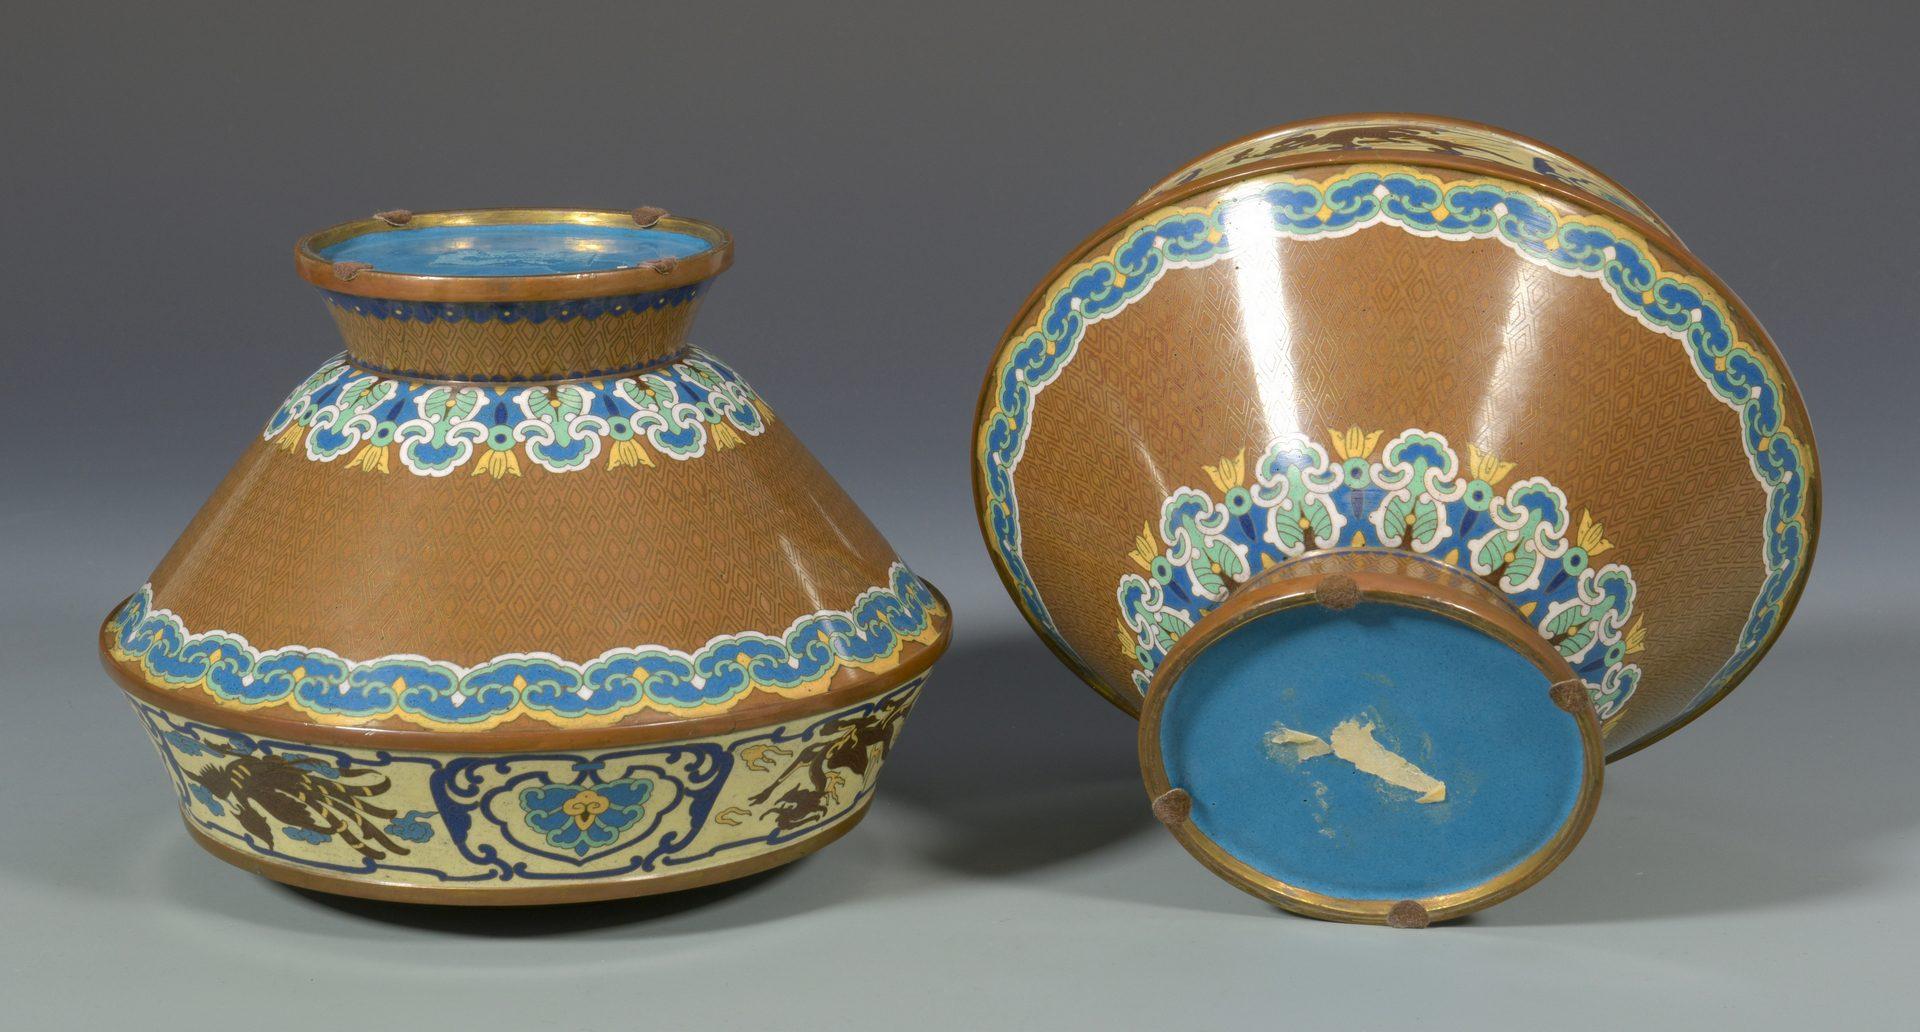 Lot 671: Pr. Asian Cloisonne Covered Vases